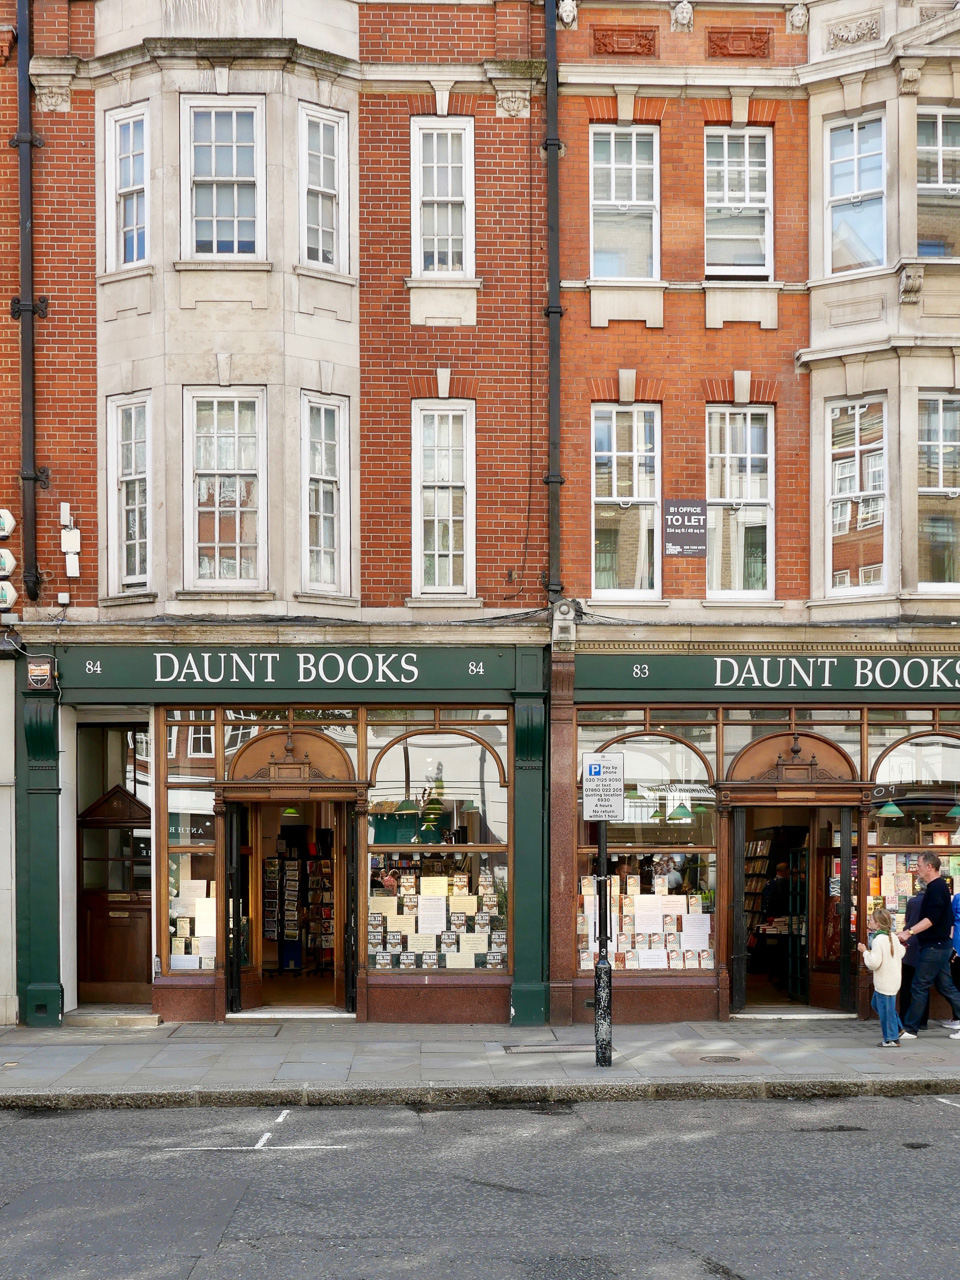 Cara Sharratt Travel - Daunt Books in Marylebone - London, England